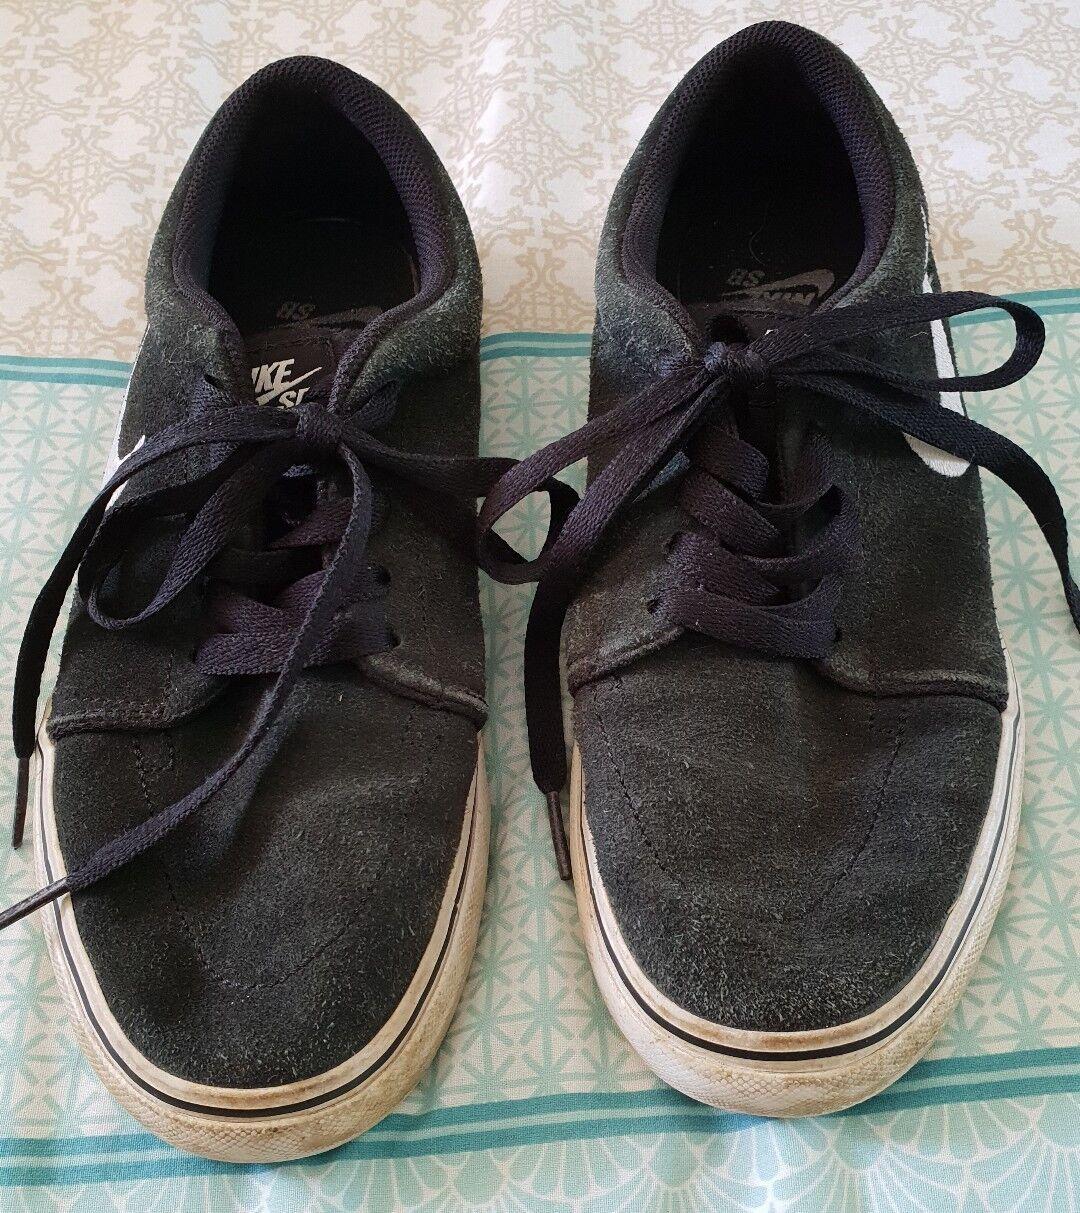 NIKE Black SB Sneakers Skate Shoes Black NIKE Suede Casual Unisex US 6 B10 1a0480